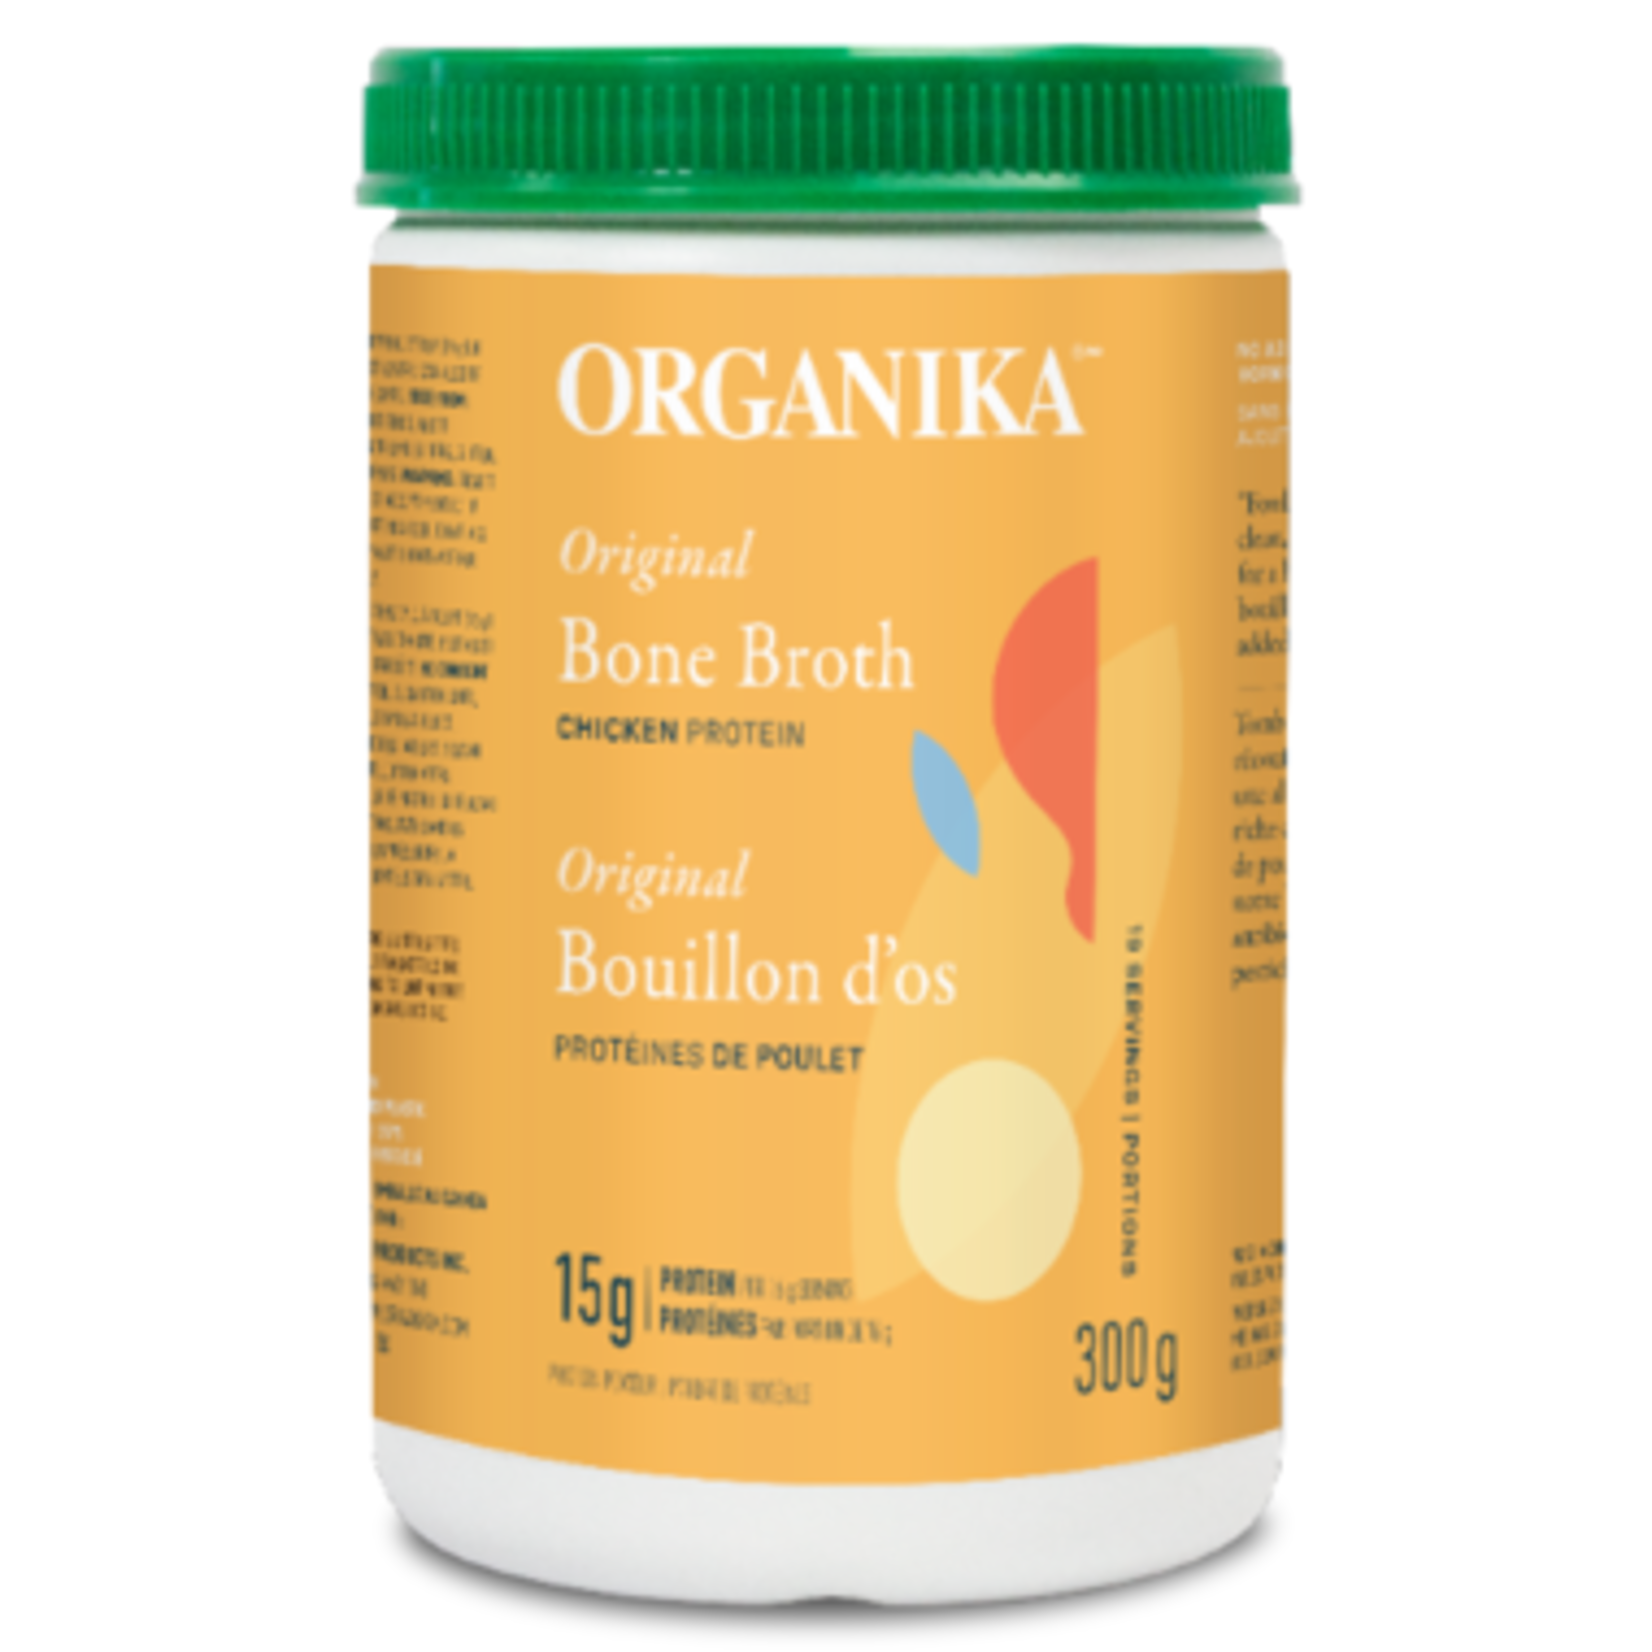 Organika Organika Original Chicken Bone Broth Powder 300g